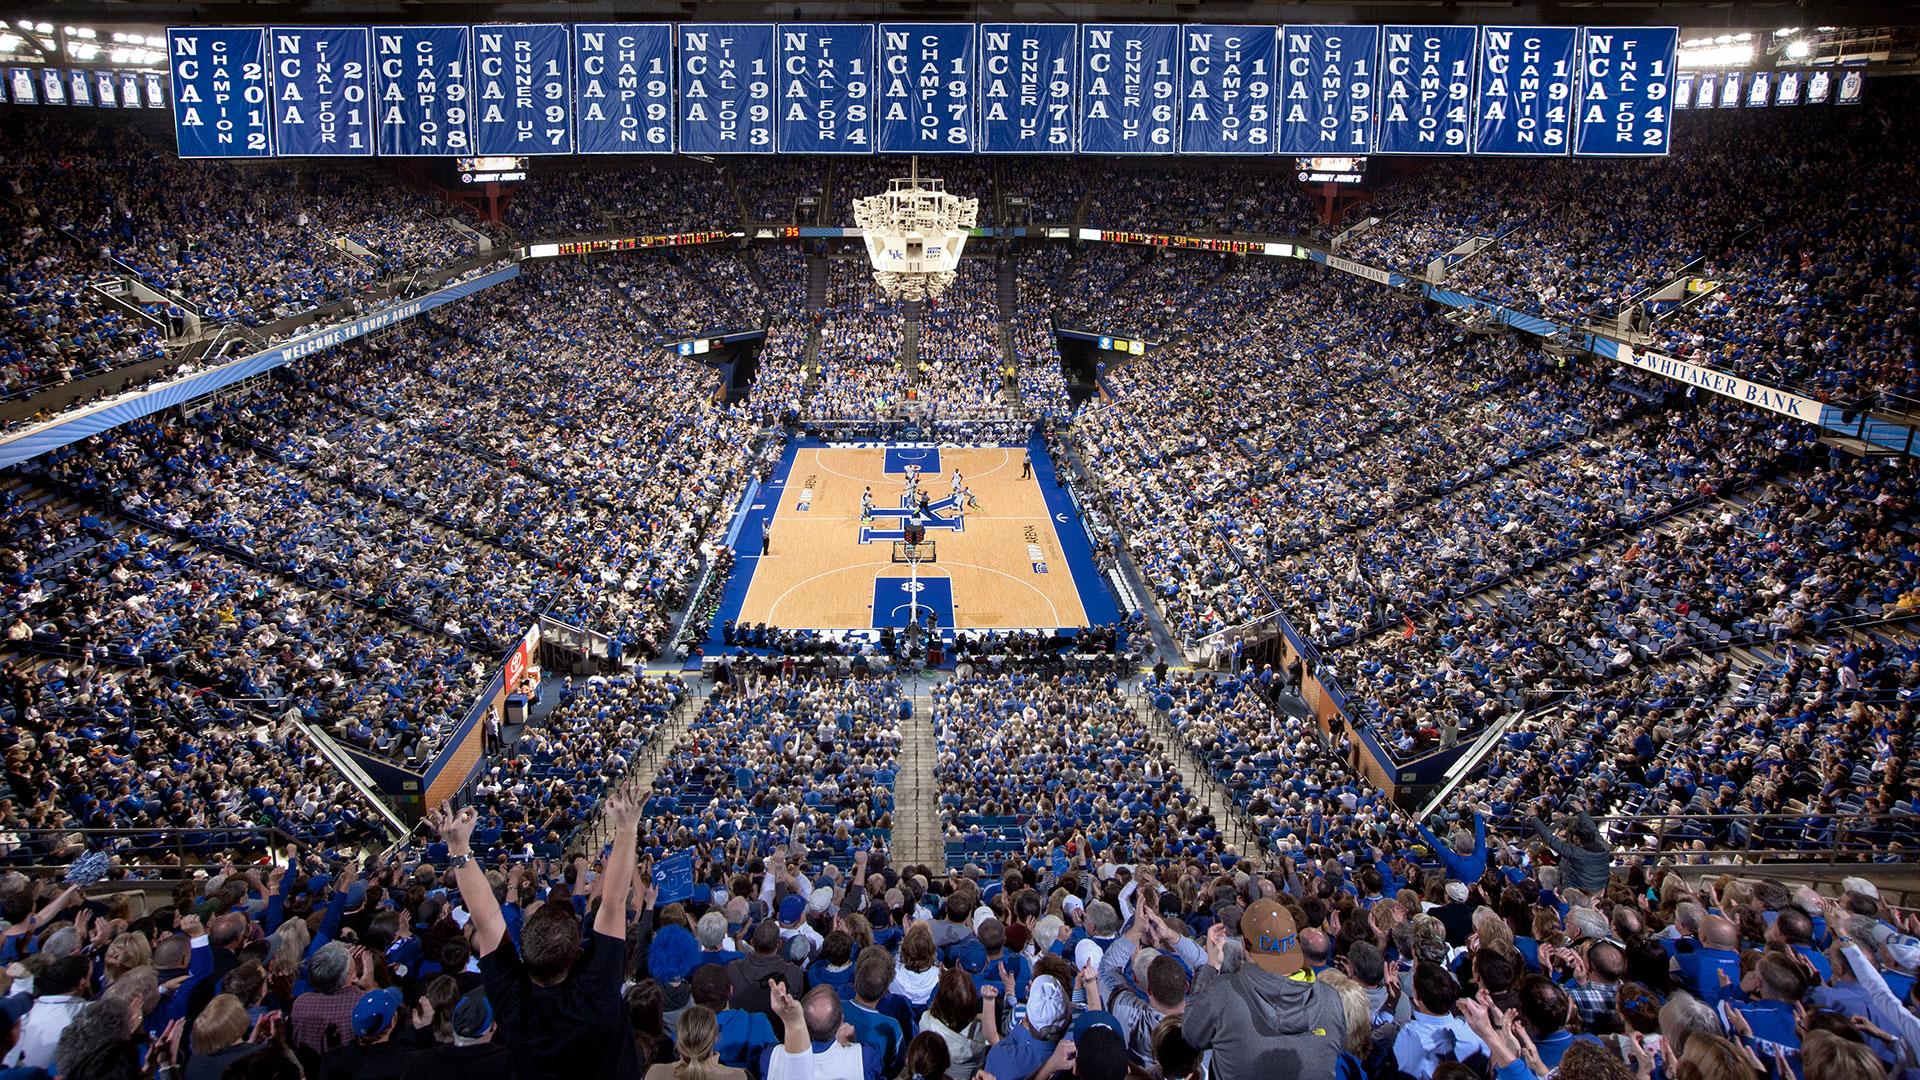 desktop wallpaper for the real University of Kentucky basketball 1920x1080